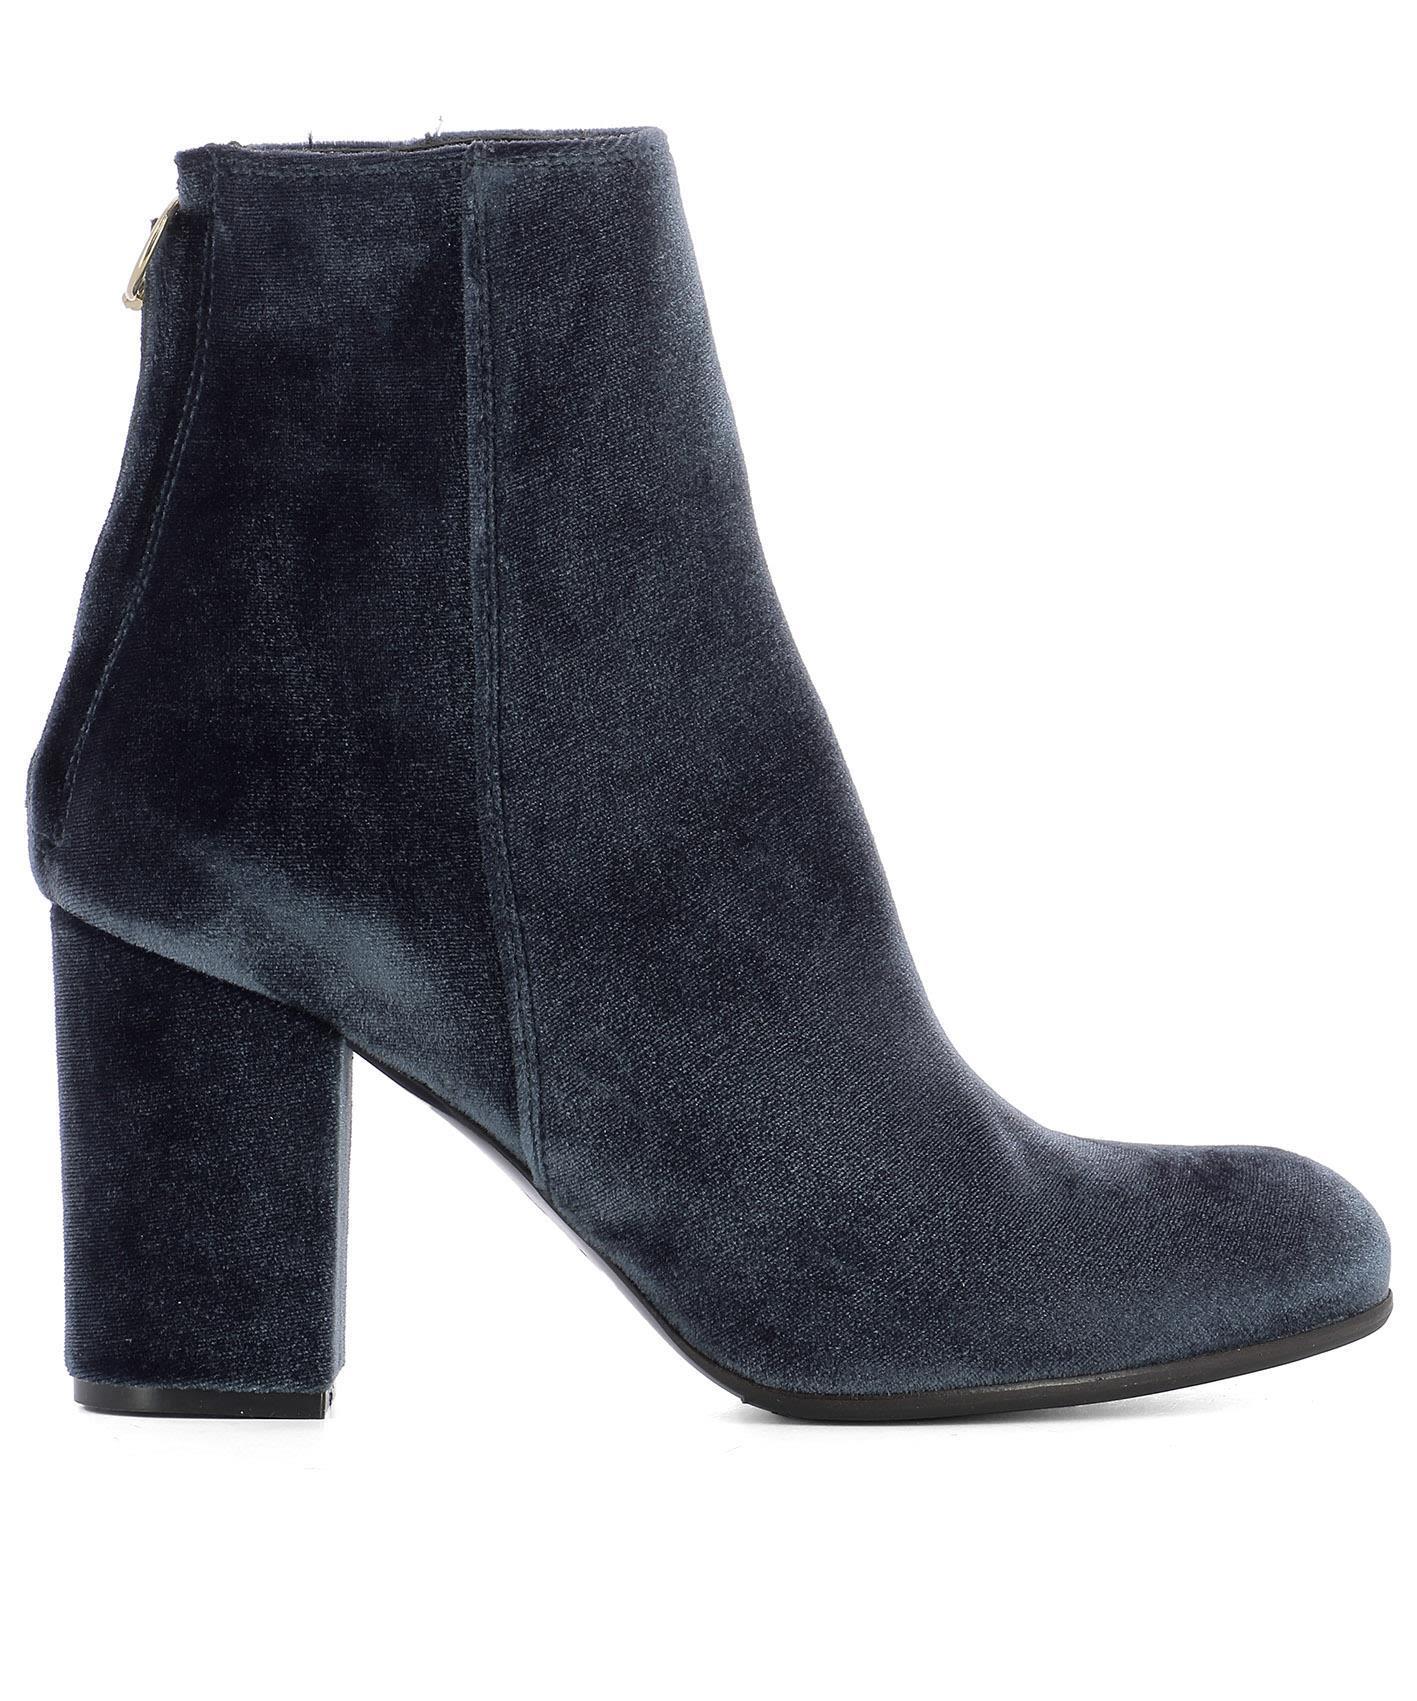 Paris Texas Blue Velvet Heeled Ankle Boots